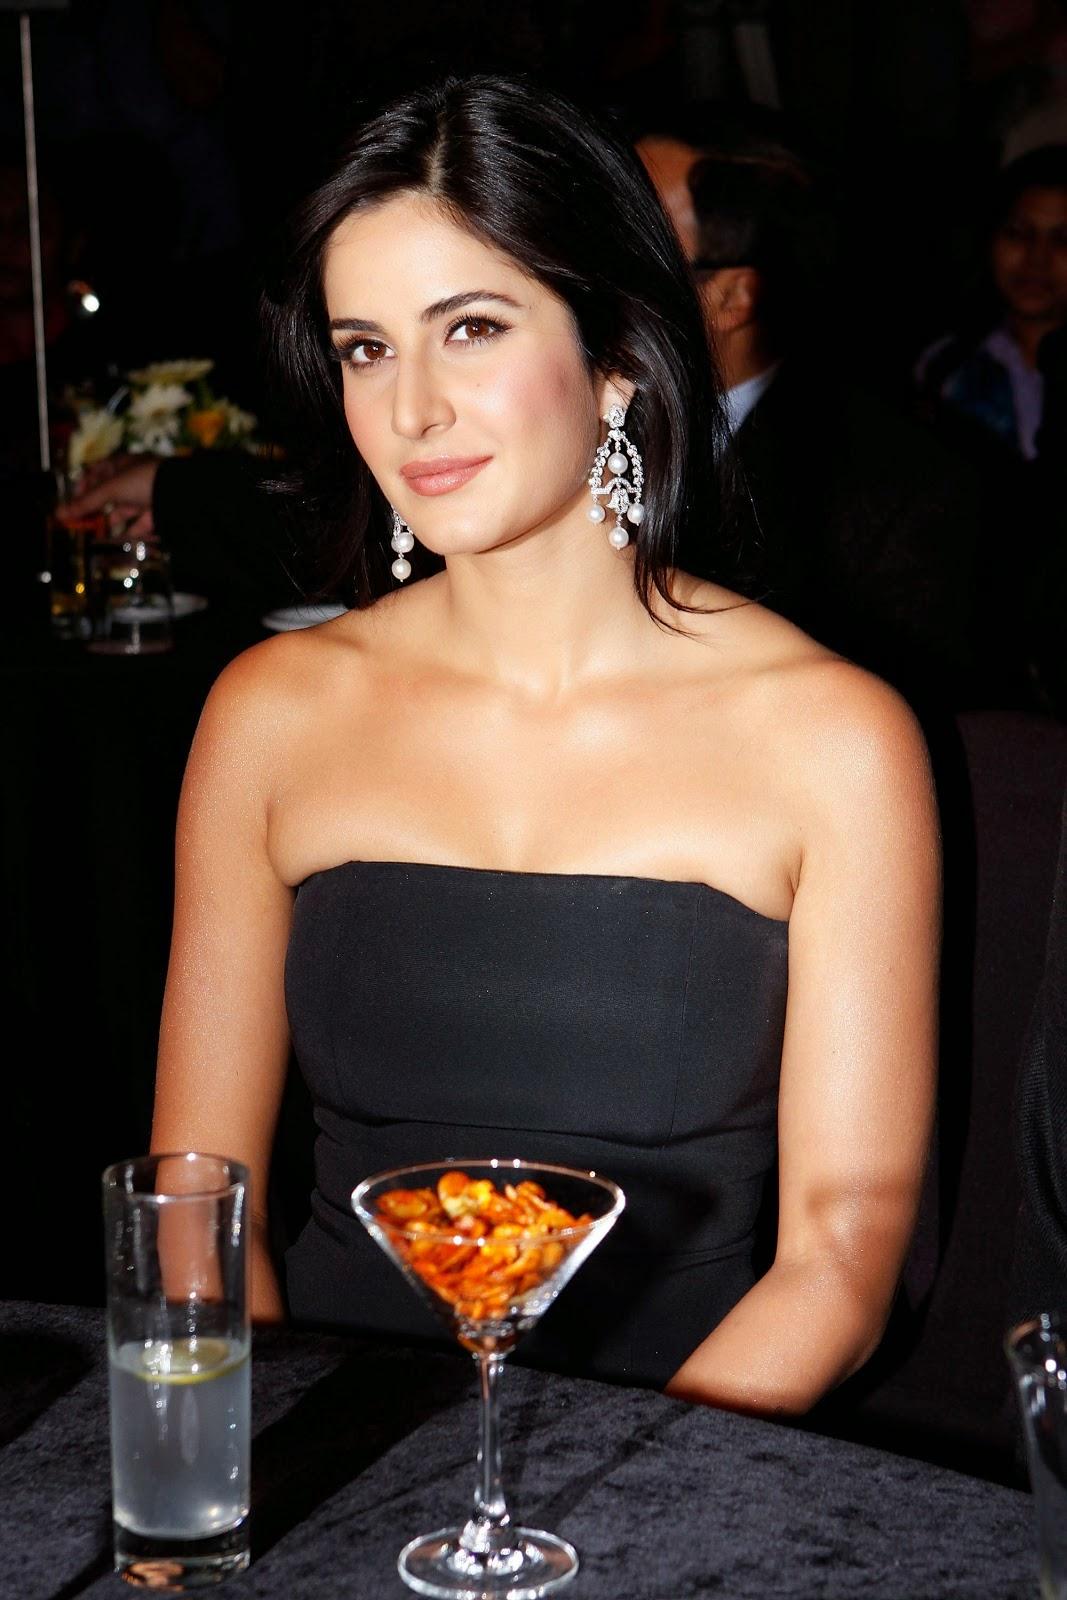 Katrina Kaif Drop Dead Gorgeous In Black Skirt At The India Autocar Awards in Mumbai